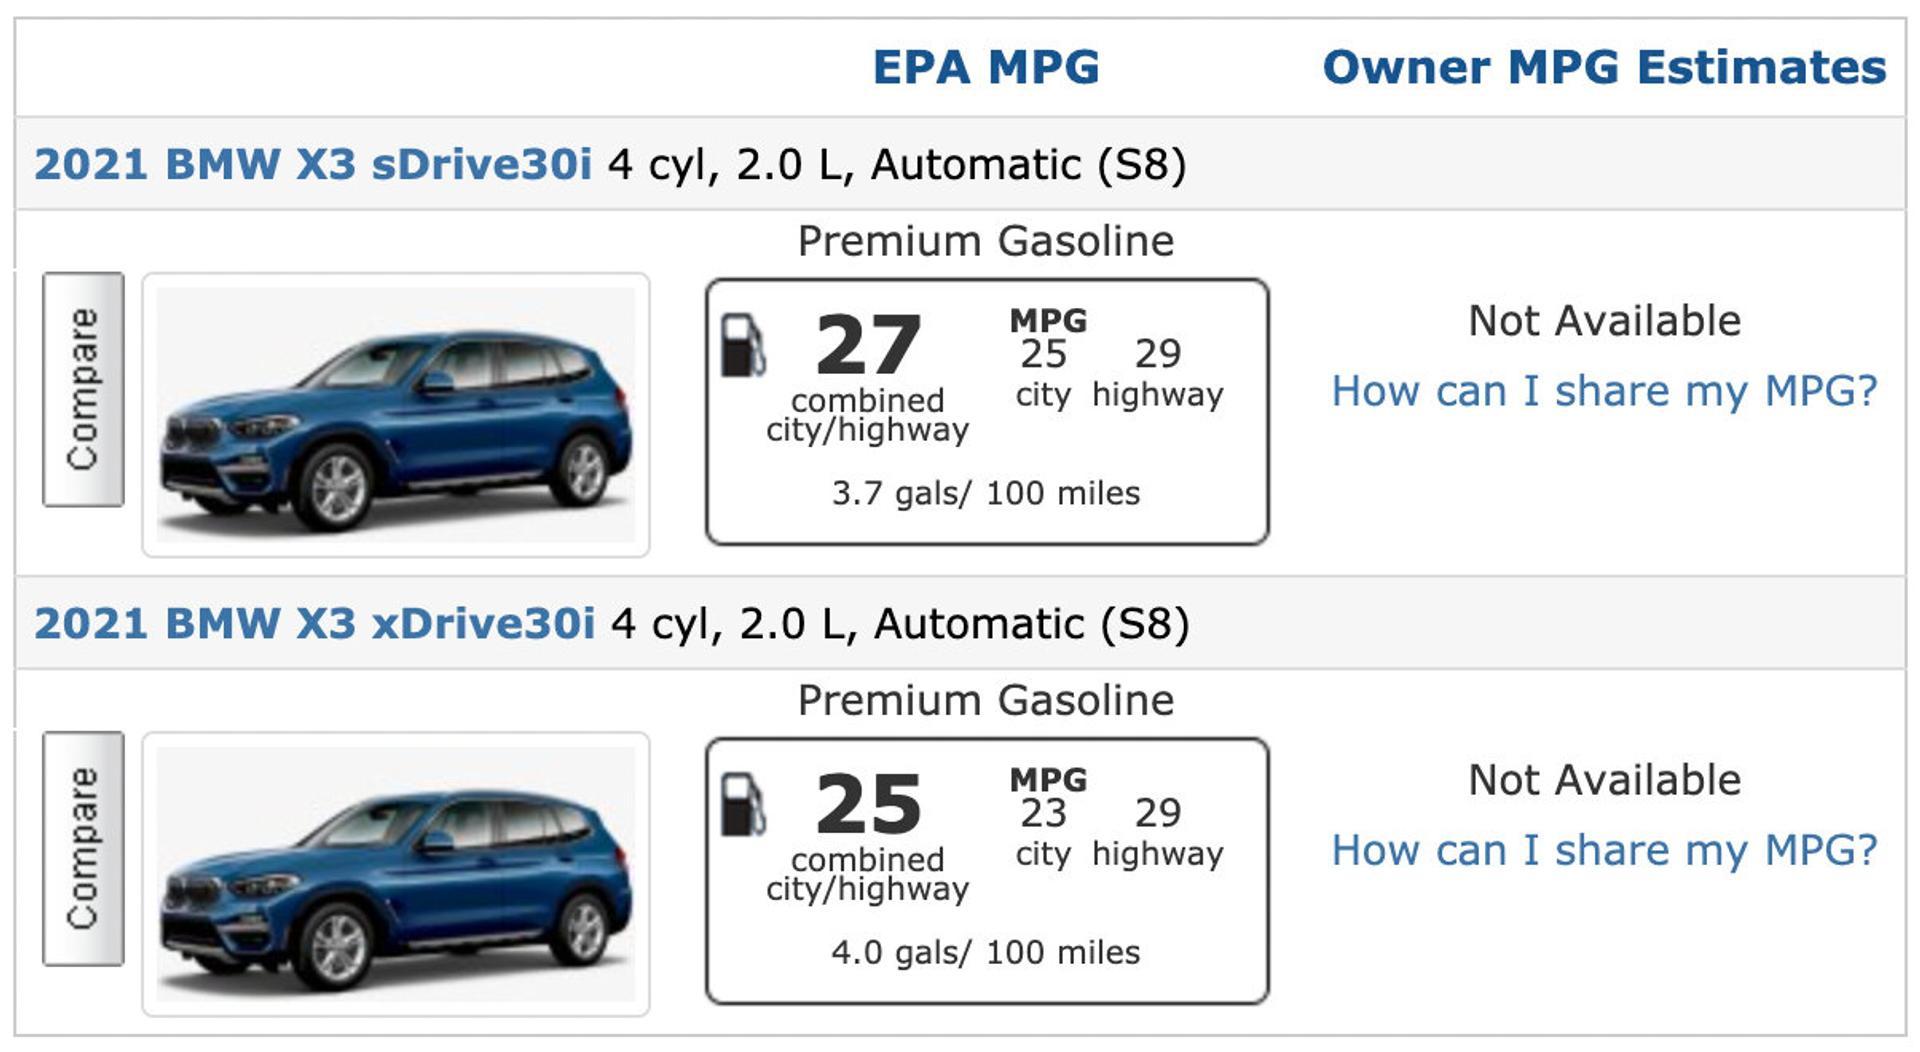 BMW X3 fuel economy numbers